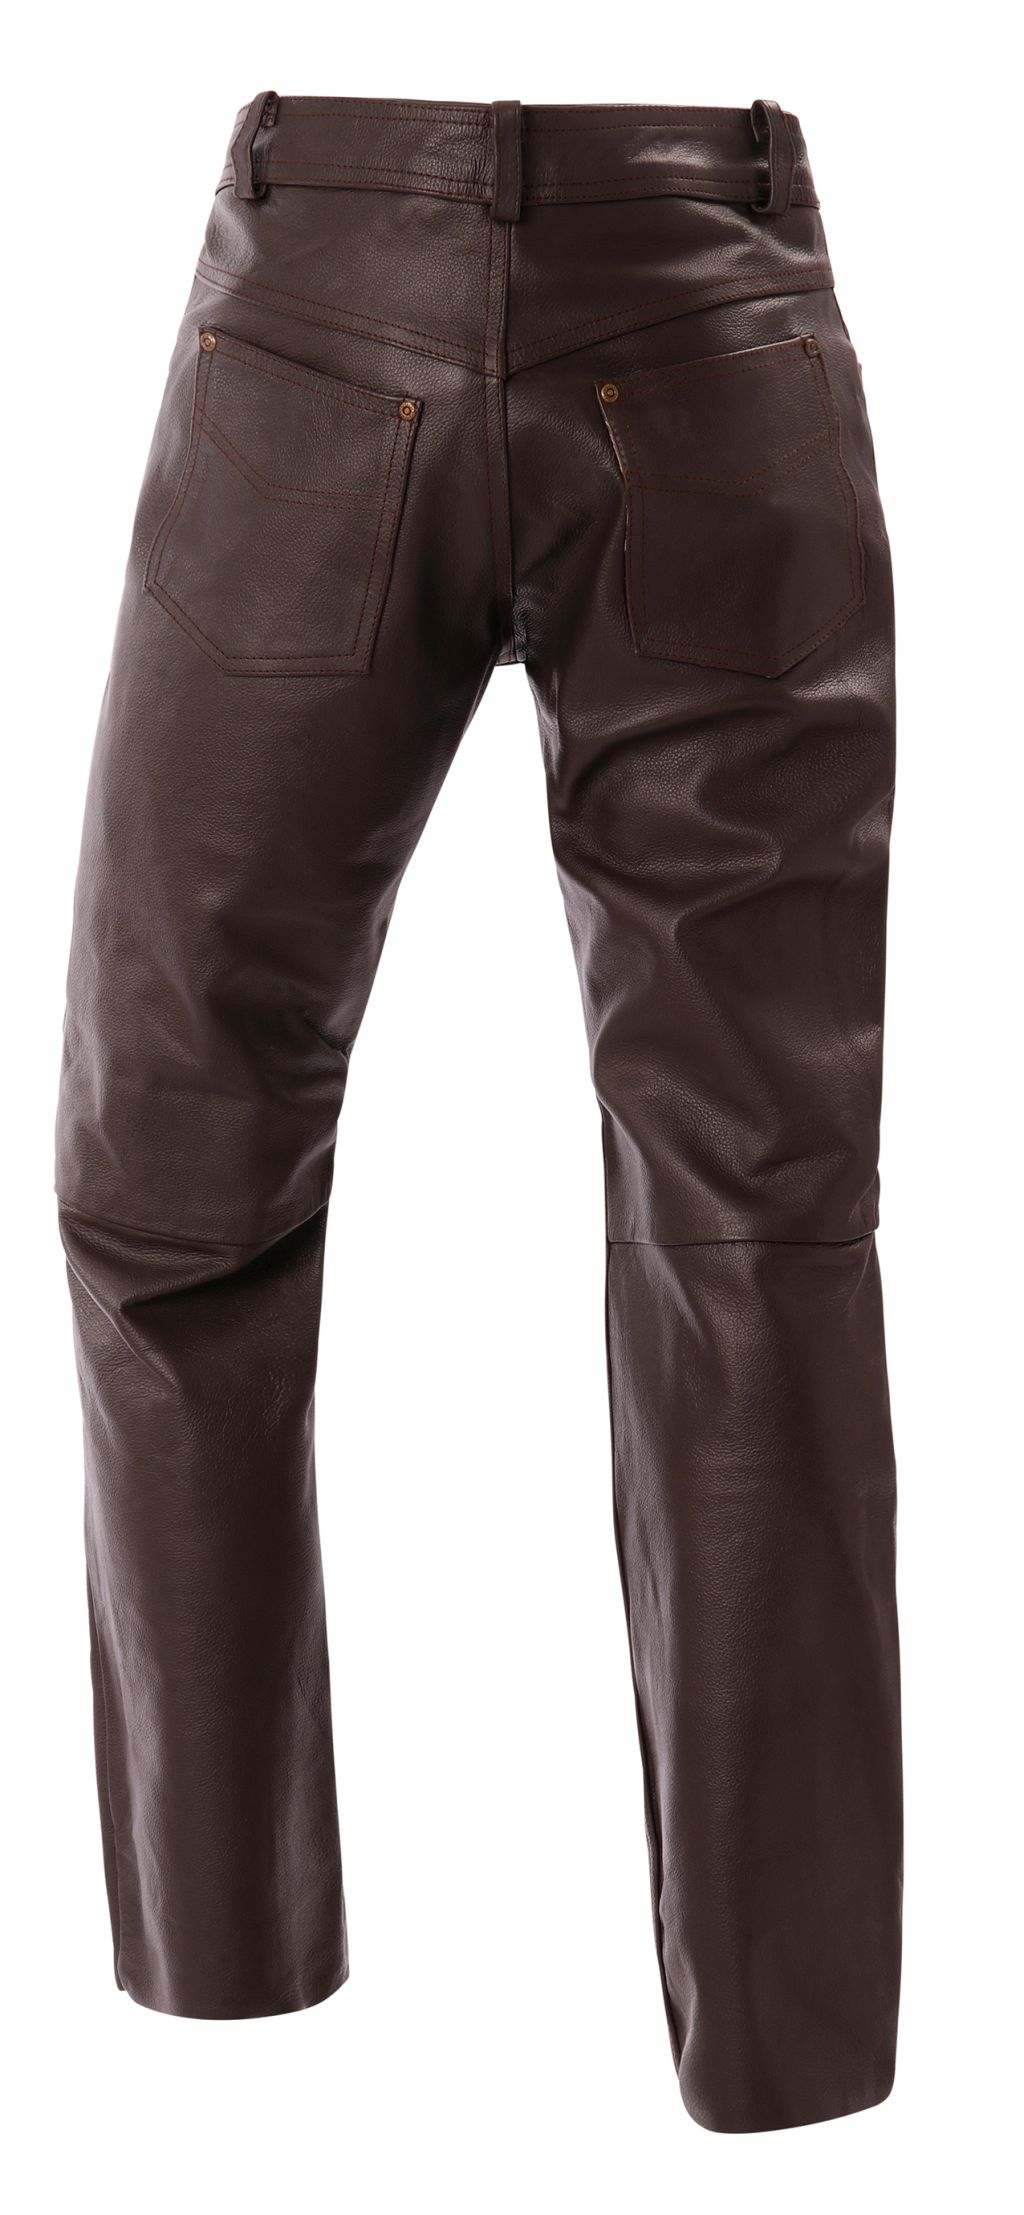 Bangla Herren Leder Jeans Hose Braun 1507 Lederhose 29 30 31 32 33 34